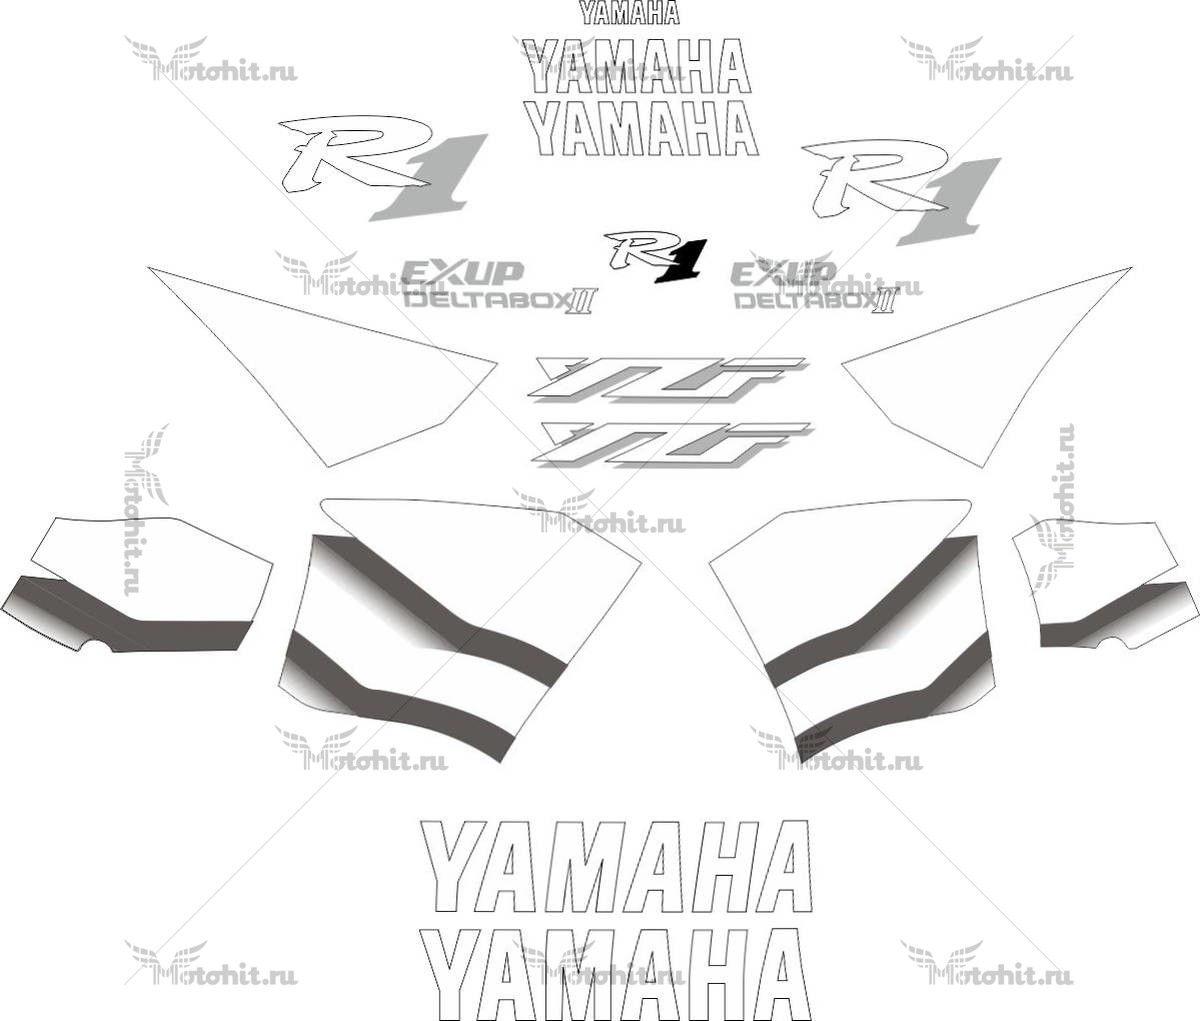 Комплект наклеек Yamaha YZF-R1 2000 WHITE-GRADIENT